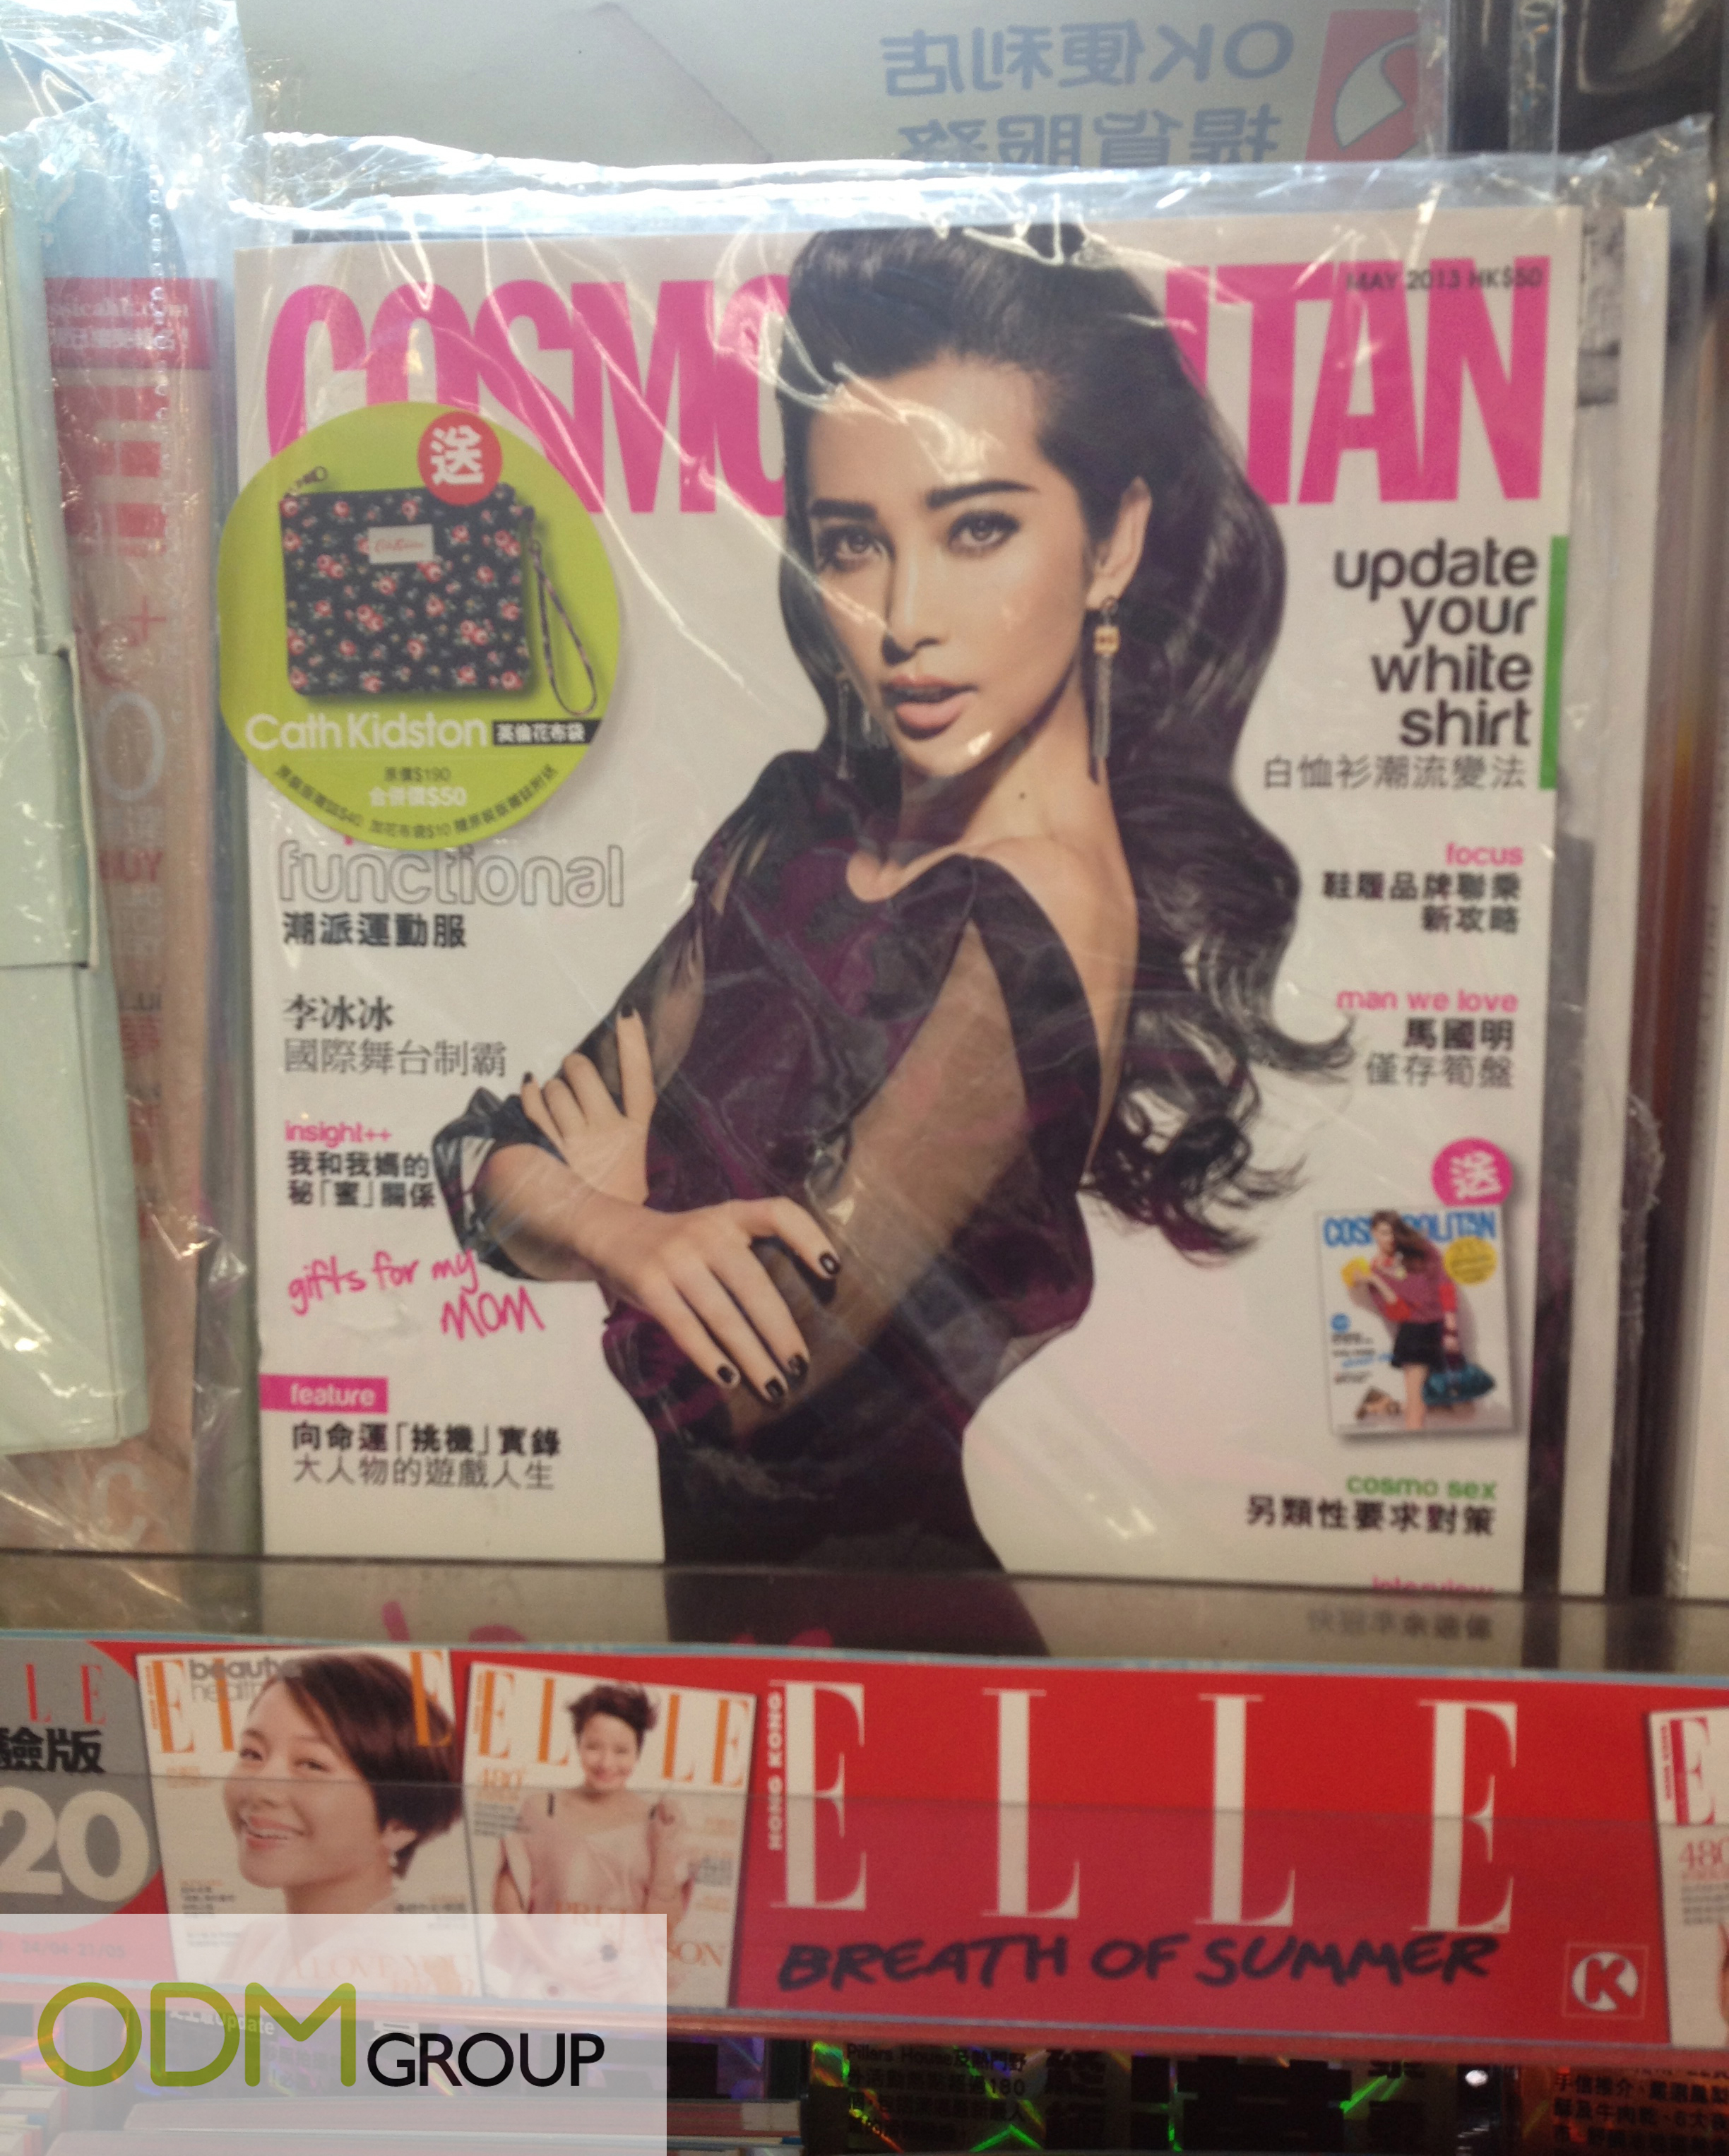 Pretty Cover Mount Gift by Cosmopolitan x Cath Kidston